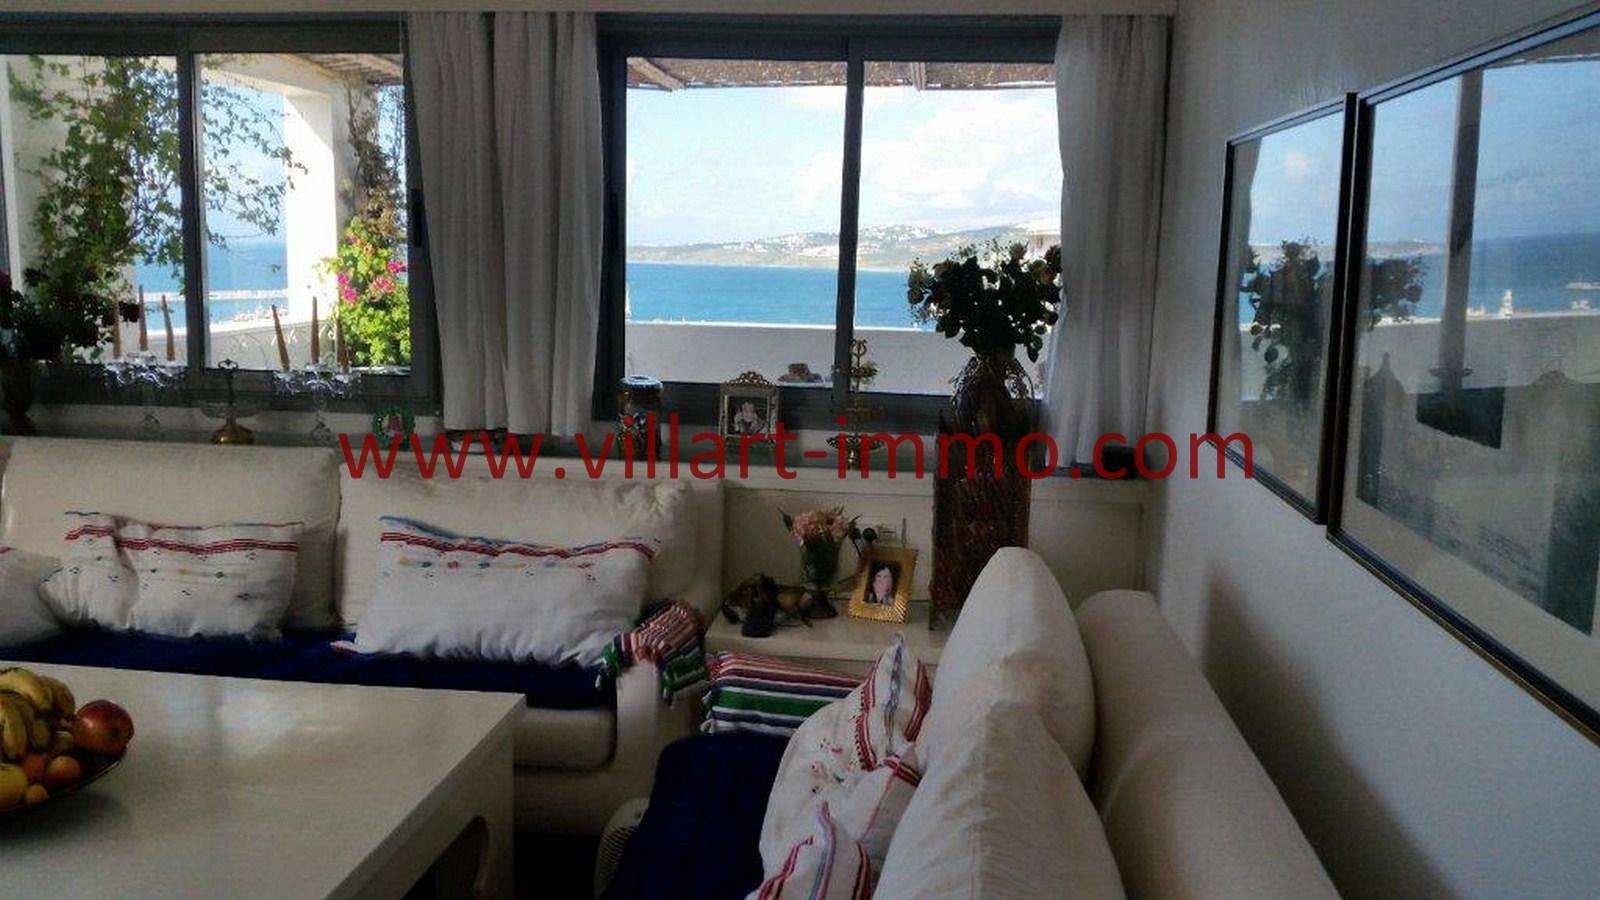 5-Vente-Appartement-Tanger-Centre-De-Ville-Salon -VA502-Villart Immo